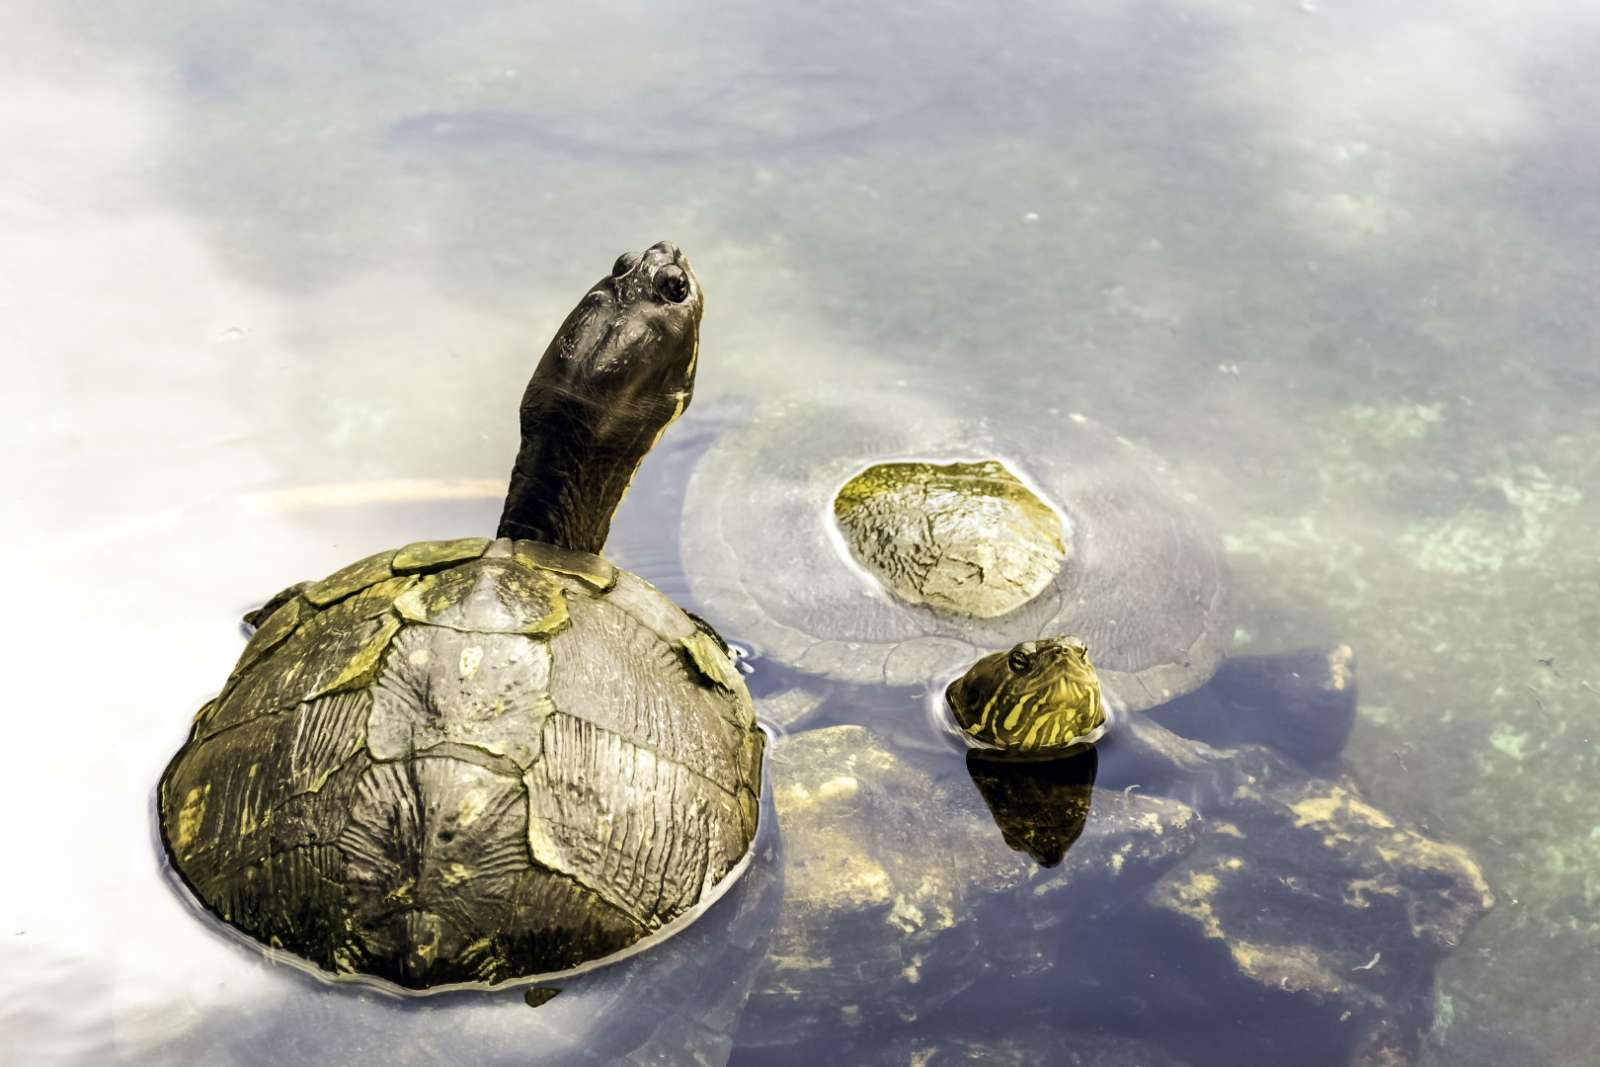 Cuban Slider Turtle in the Zapata Peninsula